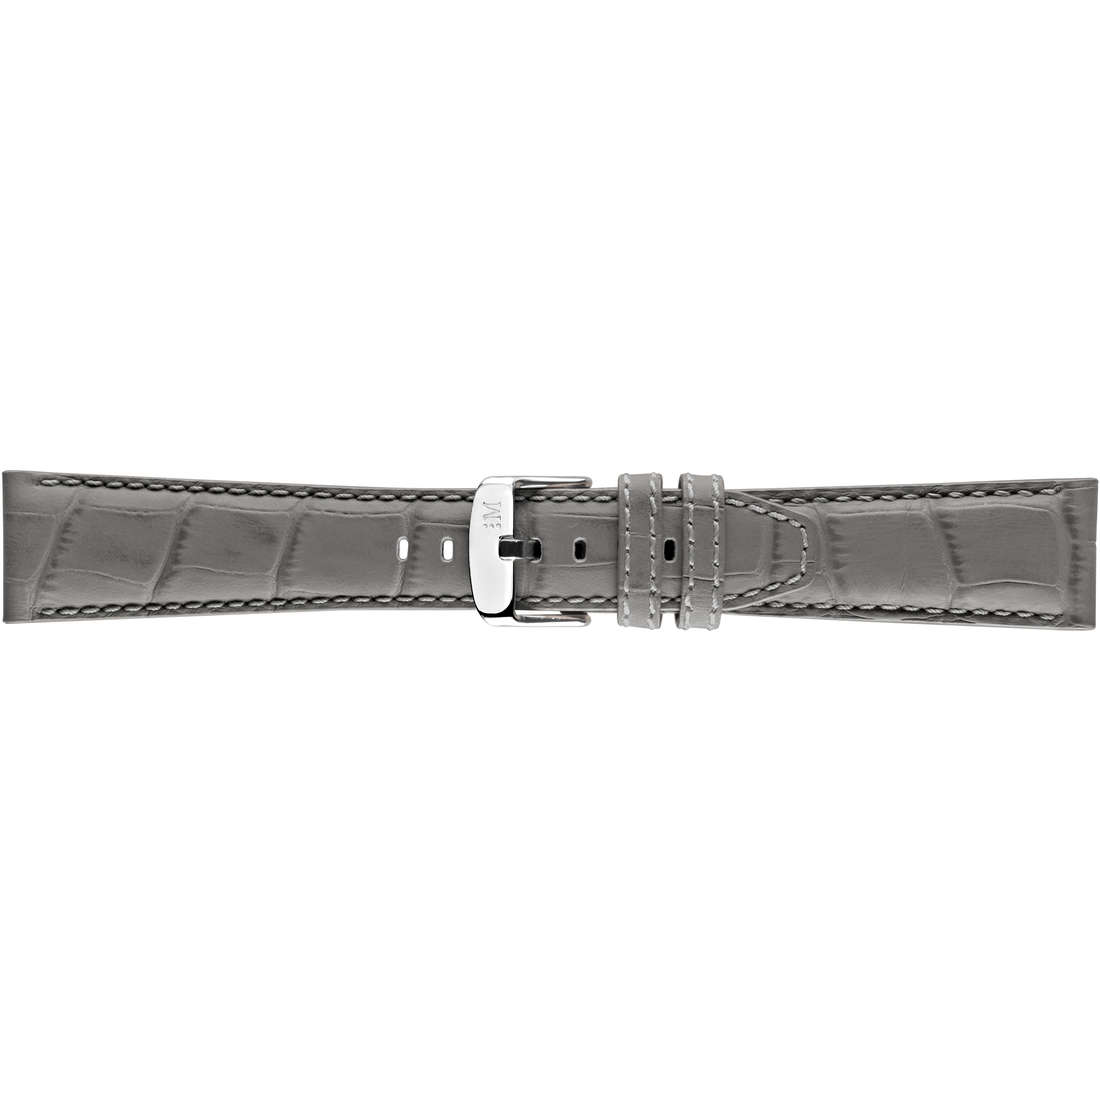 montre bande de montres homme Morellato Linea Sport A01X4497B44092CR22